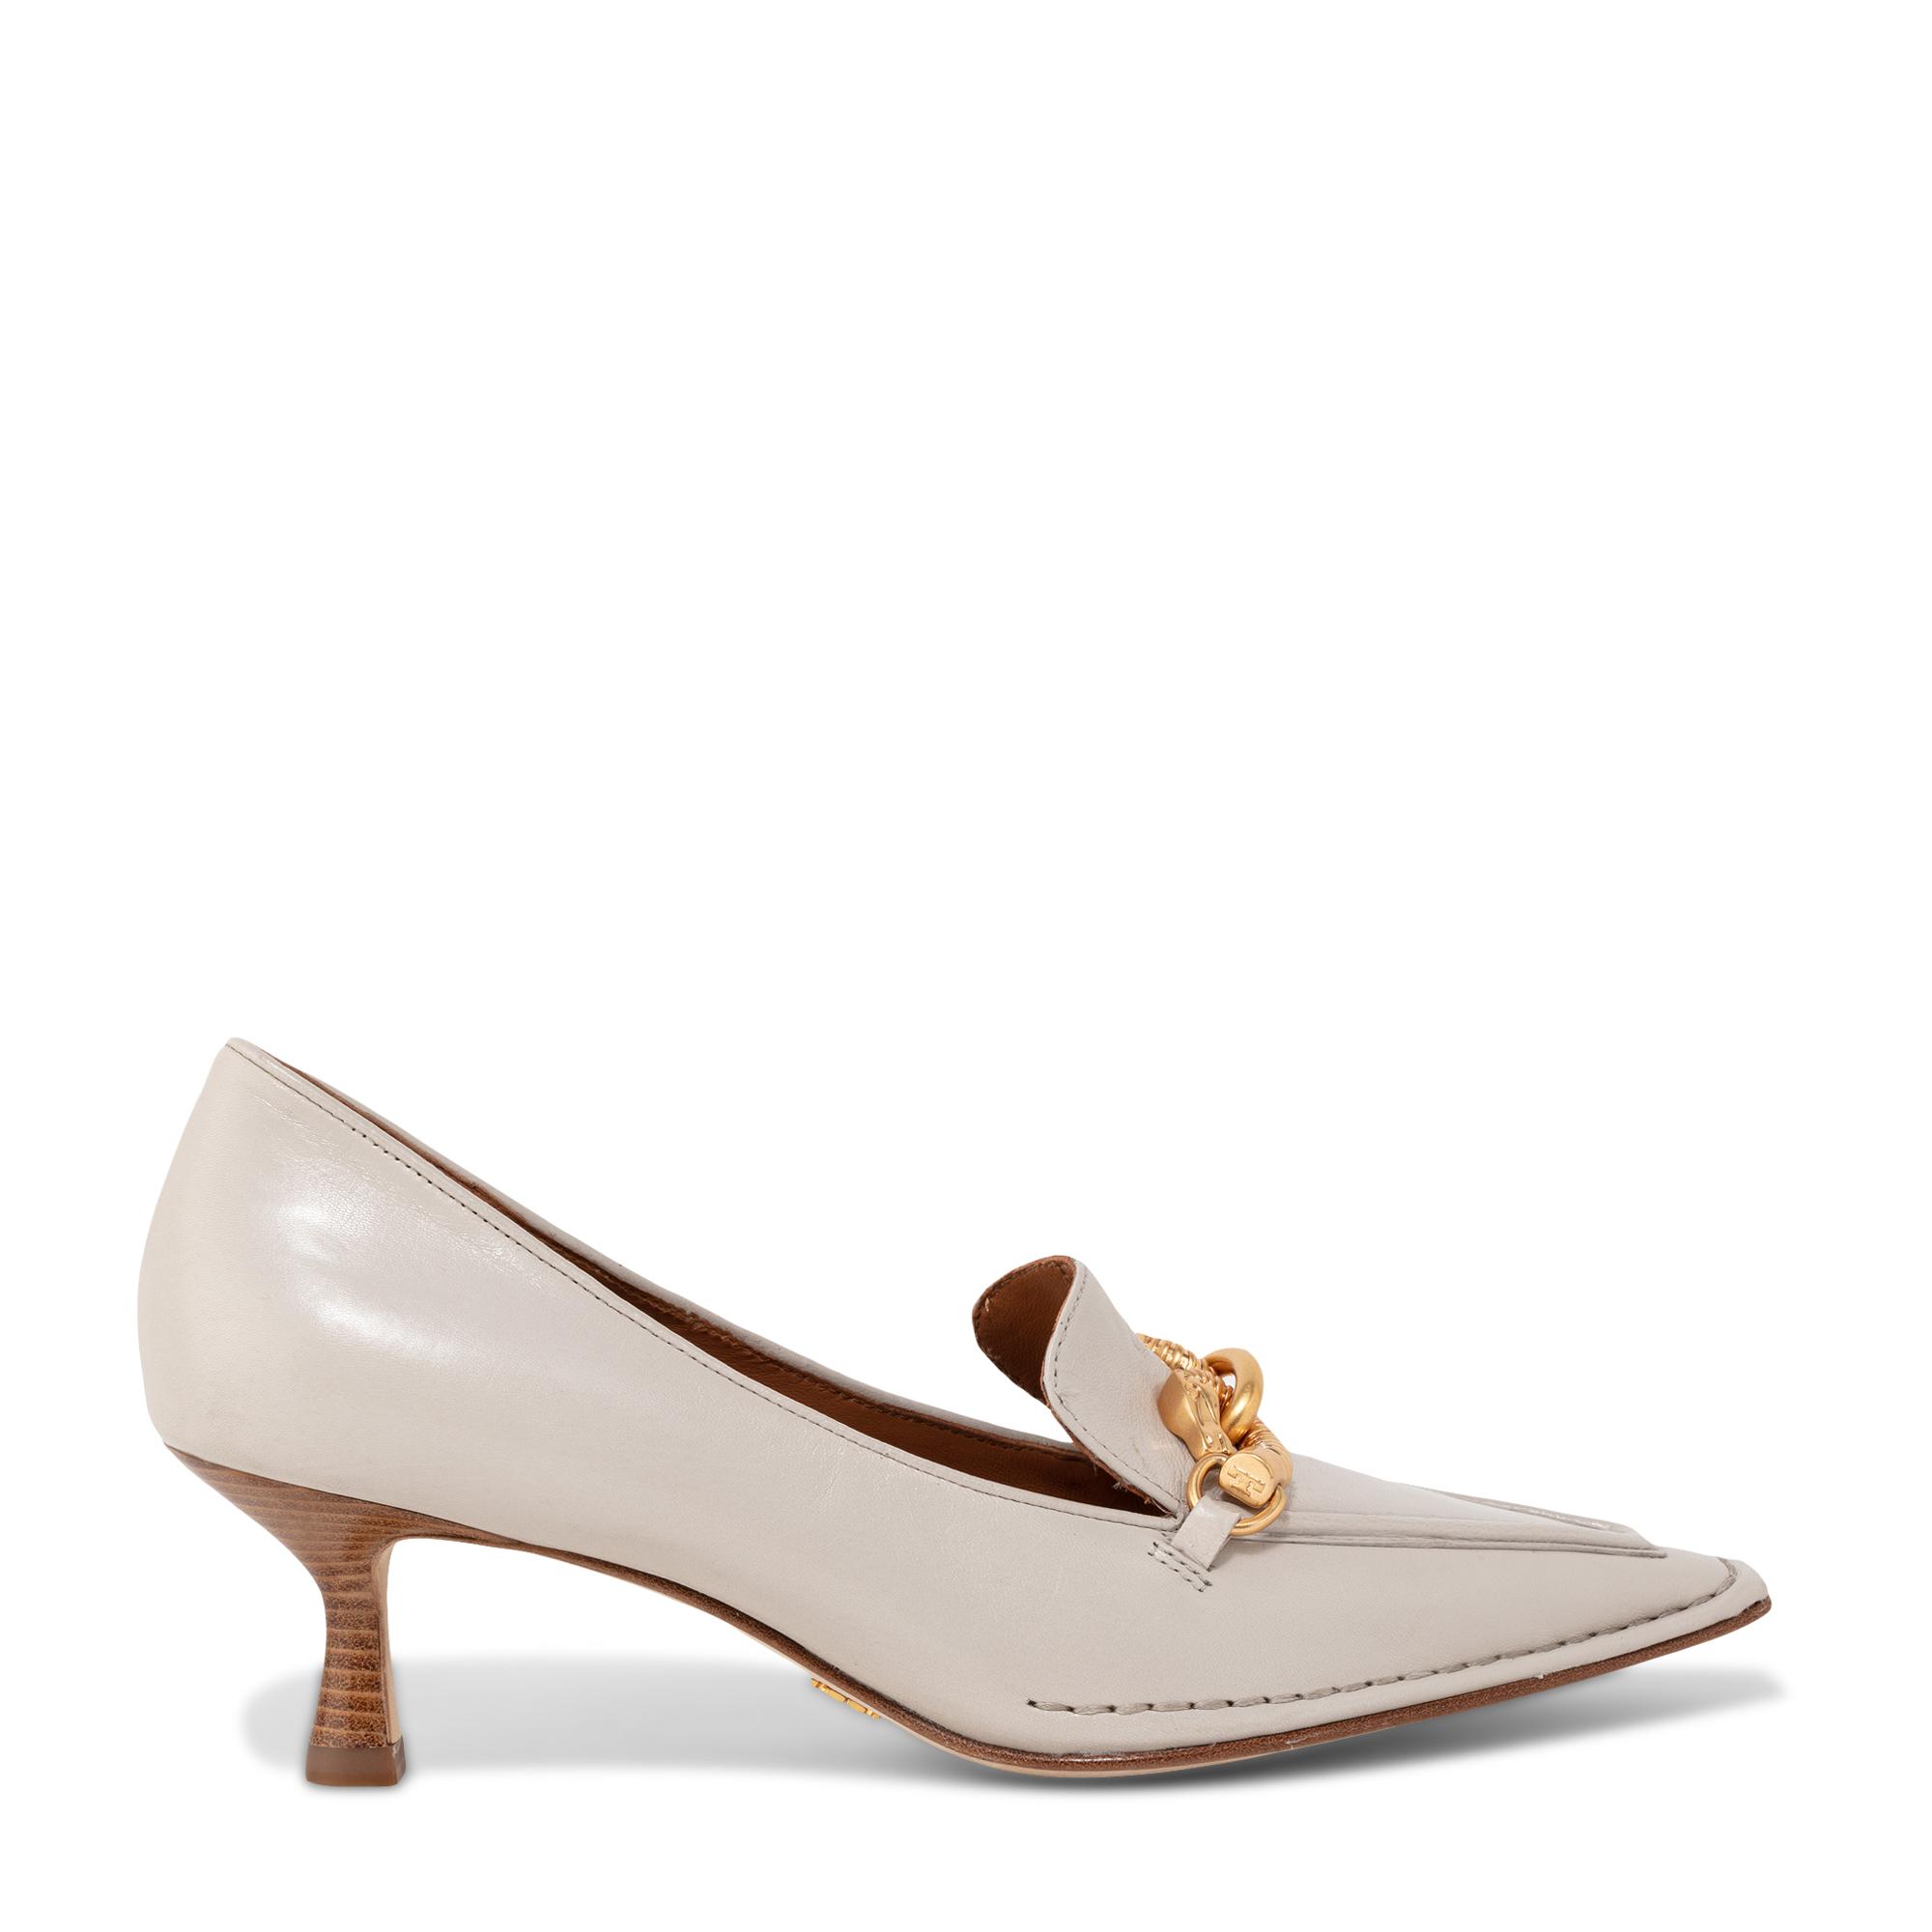 Jessa pointy-toe pumps